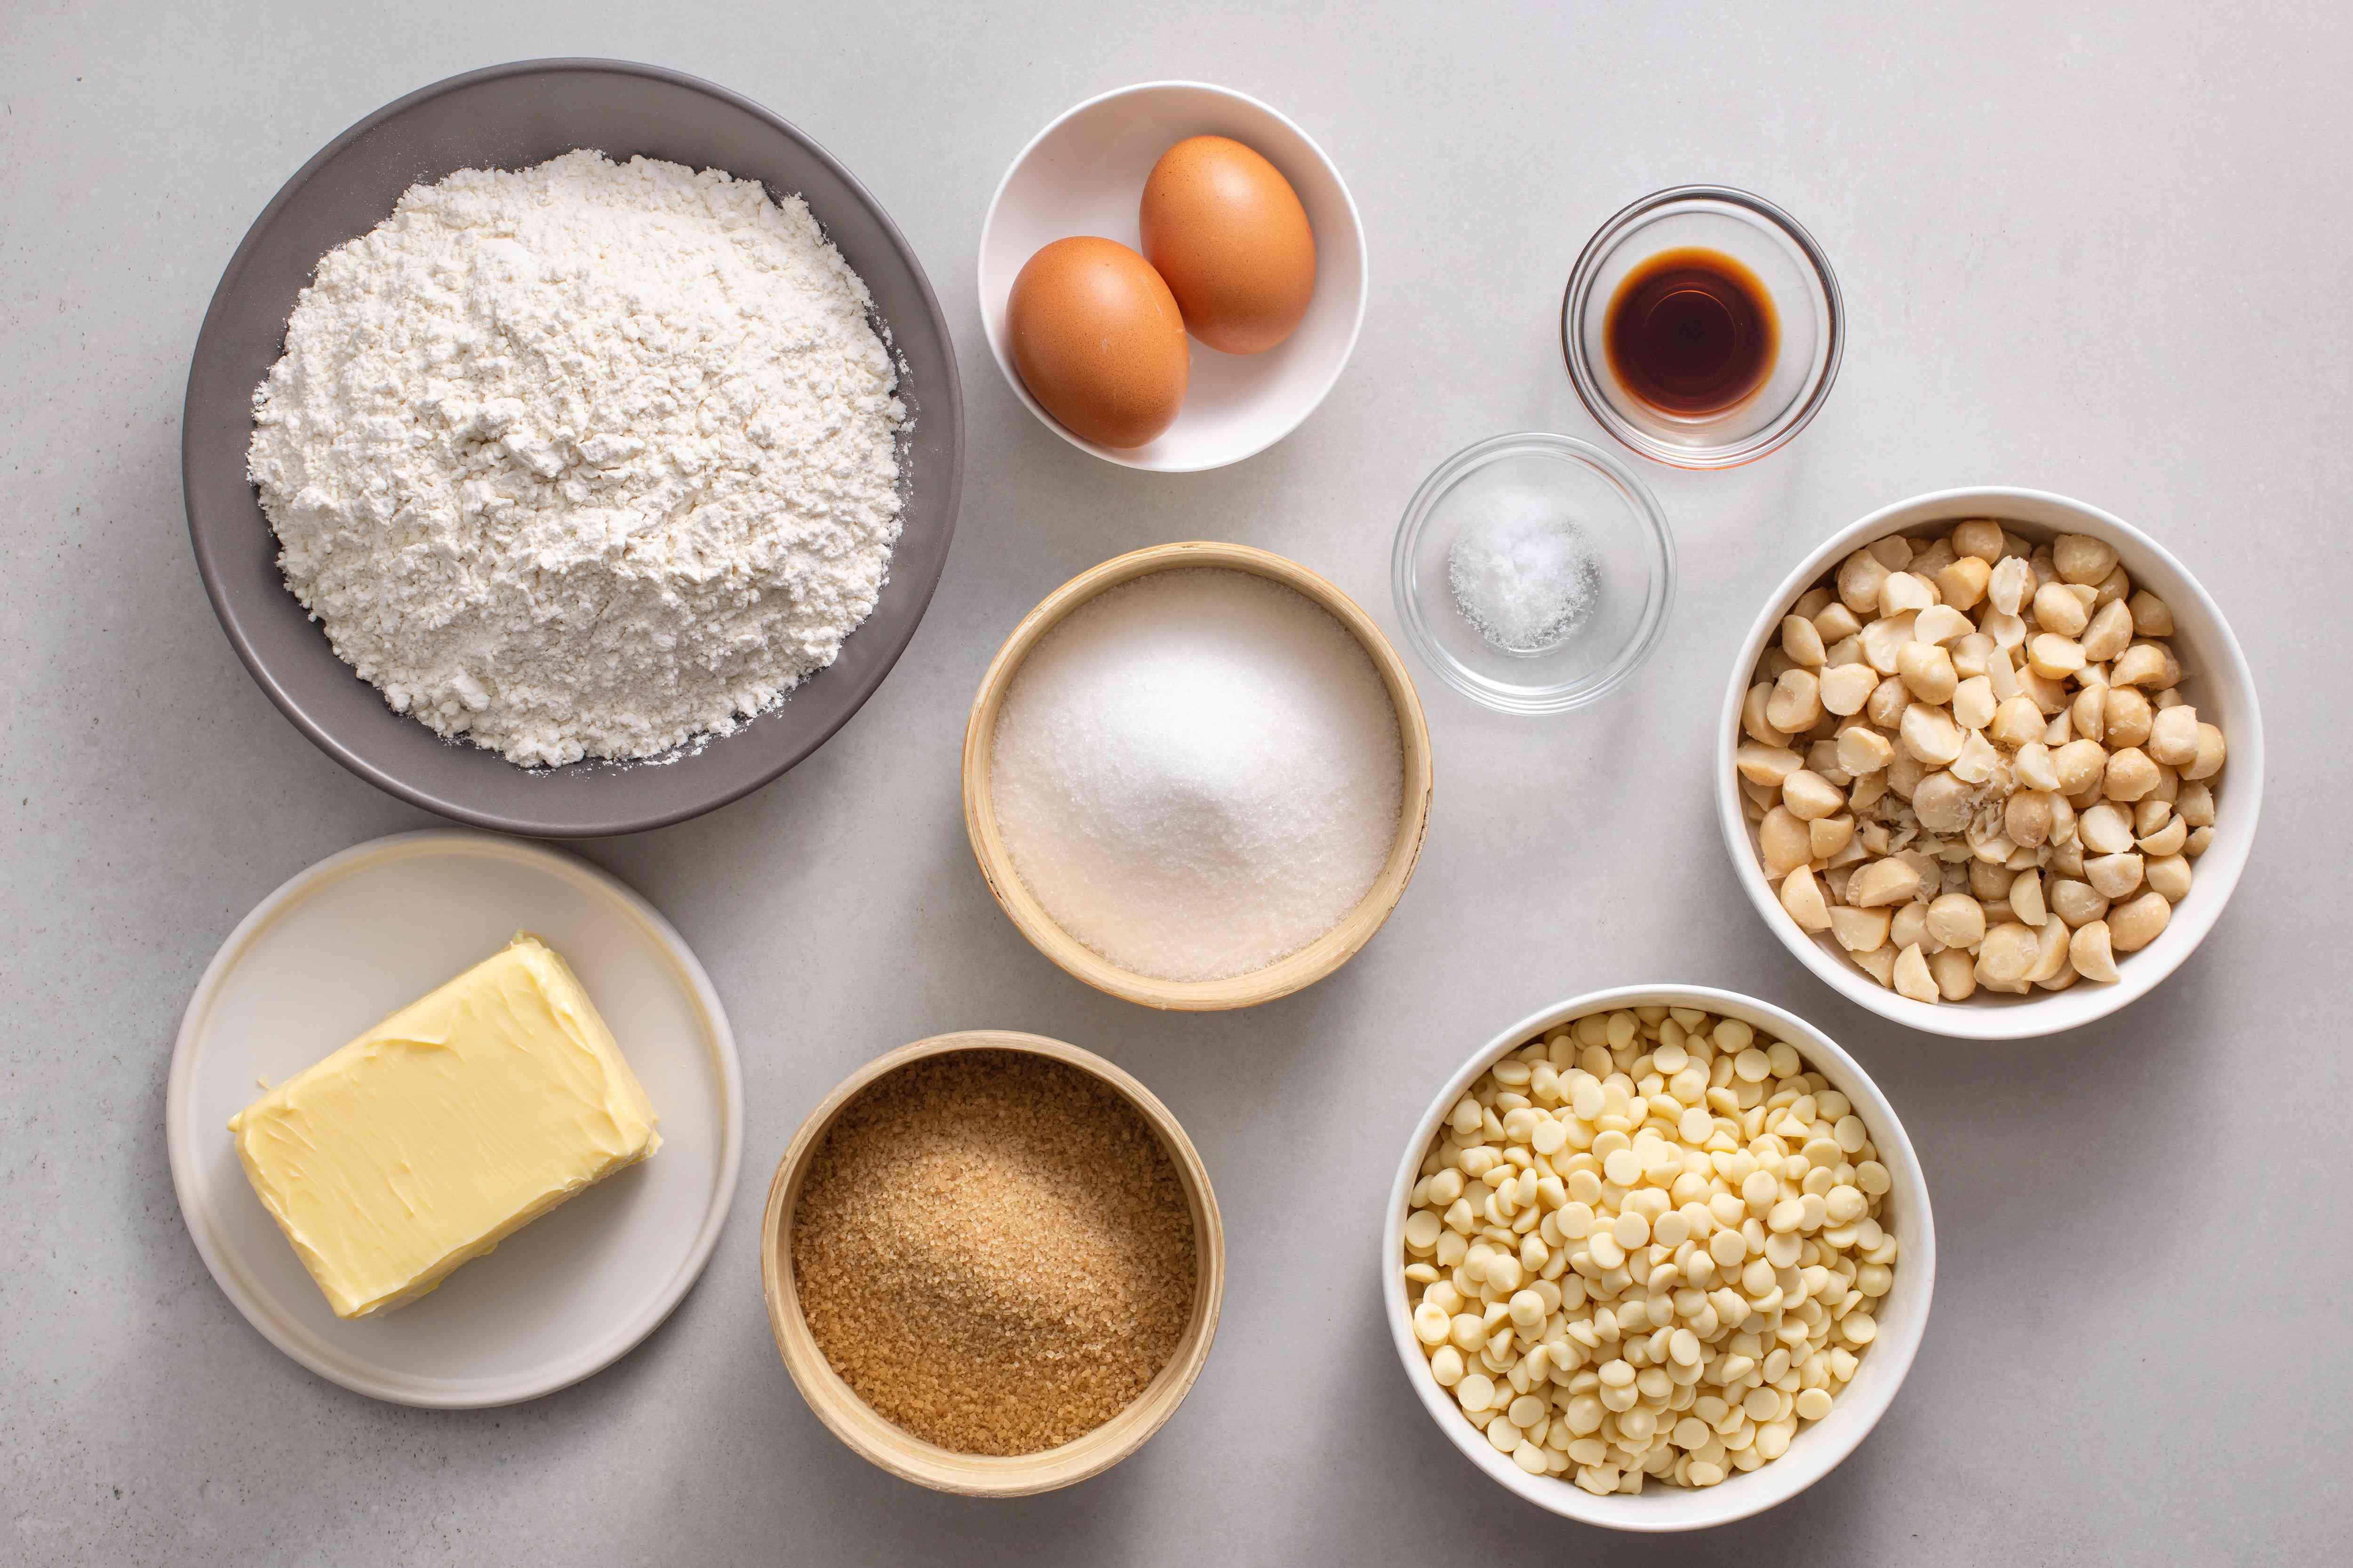 White Chocolate Macadamia Nut Cookies ingredients